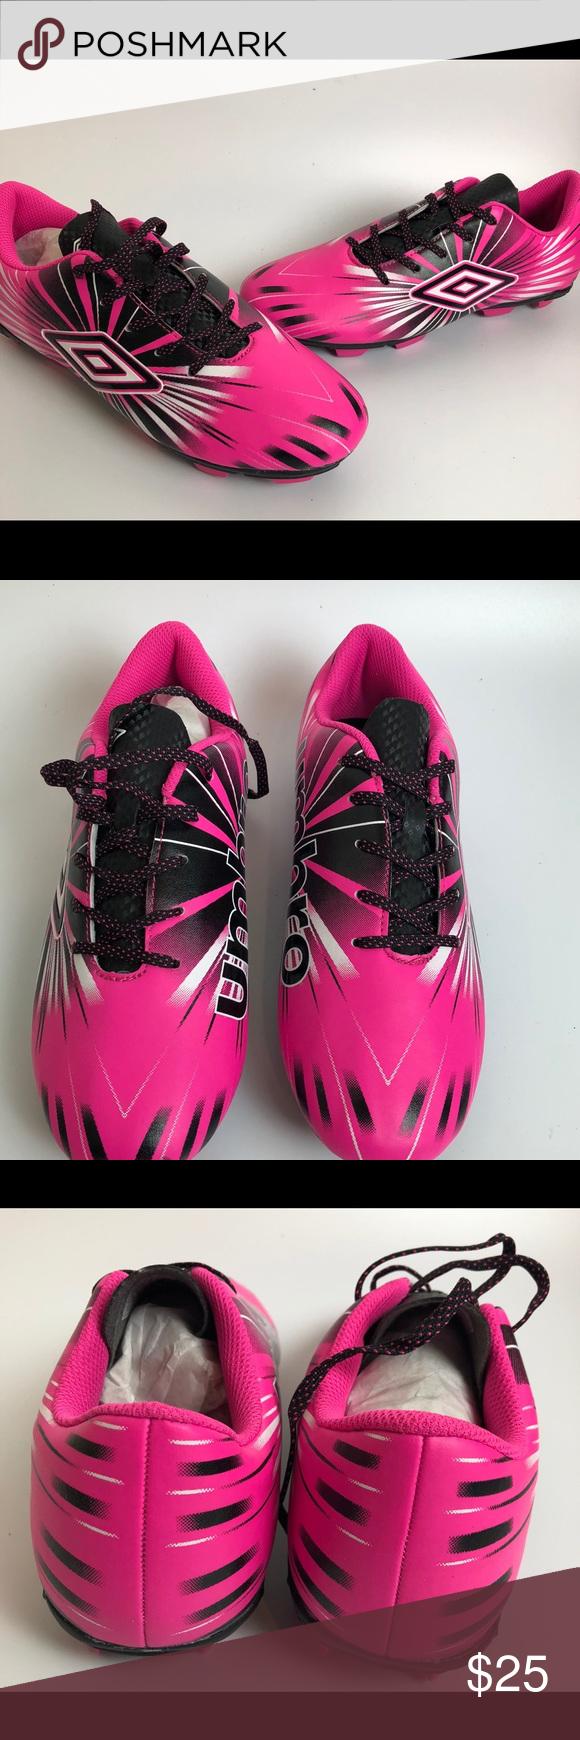 a82548d5d05 Umbro Girls Arturo 3.0 Soccer Cleats Size 4.5 Umbro Kids  Arturo 3.0 Soccer  Cleats Size 4.5 Pink Black Youth Girls Umbro Shoes